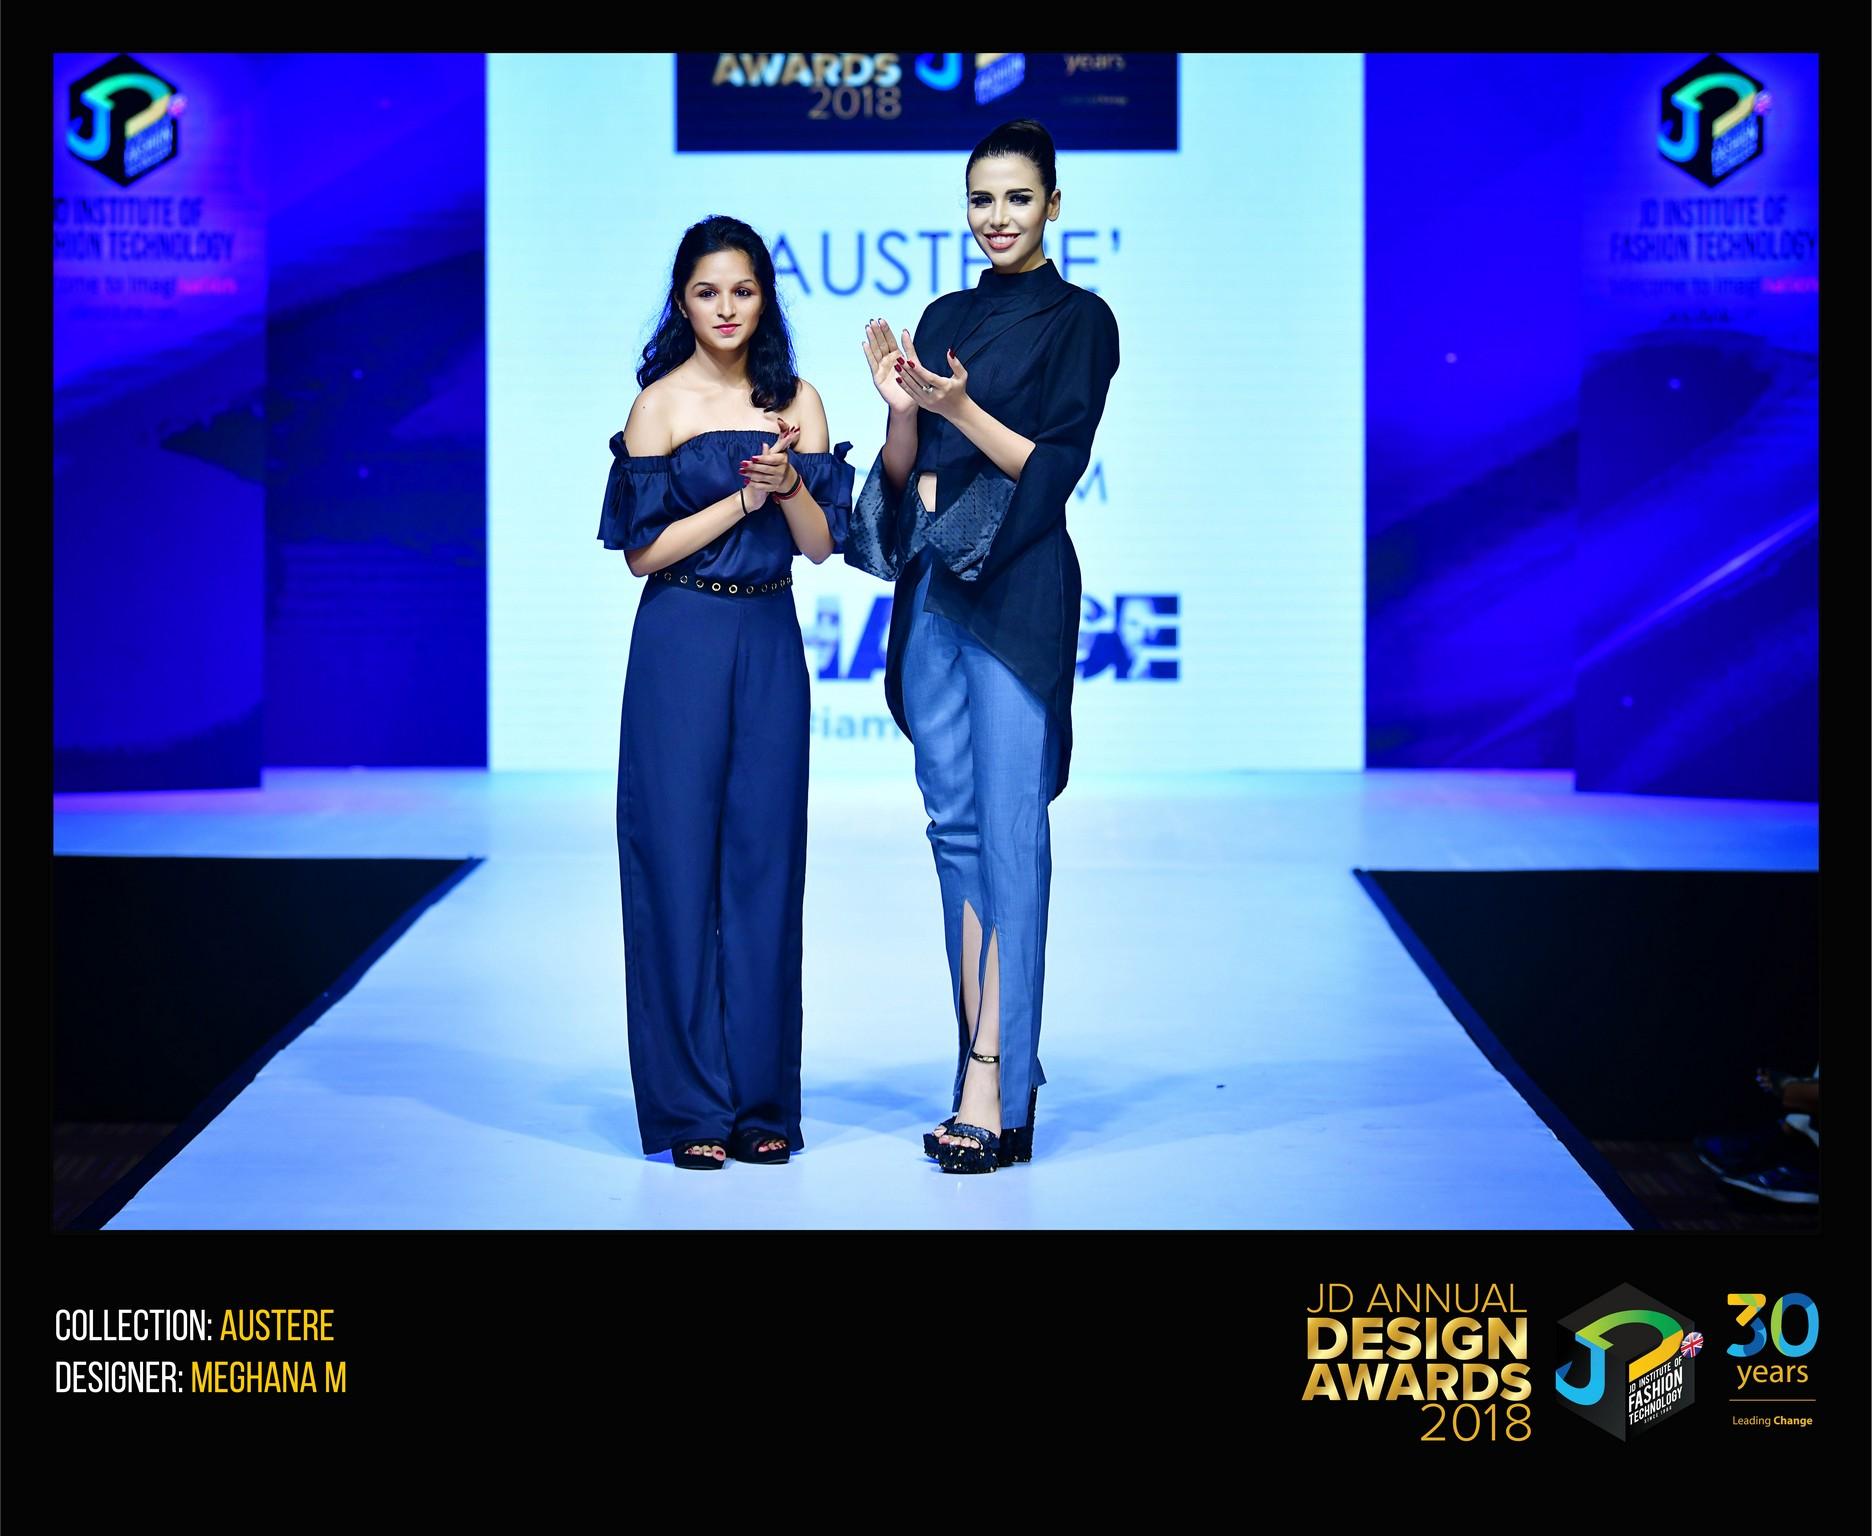 Austere – Change – JD Annual Design Awards 2018 | Designer: Meghana | Photography : Jerin Nath (@jerin_nath) austere Austere – Change – JD Annual Design Awards 2018 AUSTERE9 final